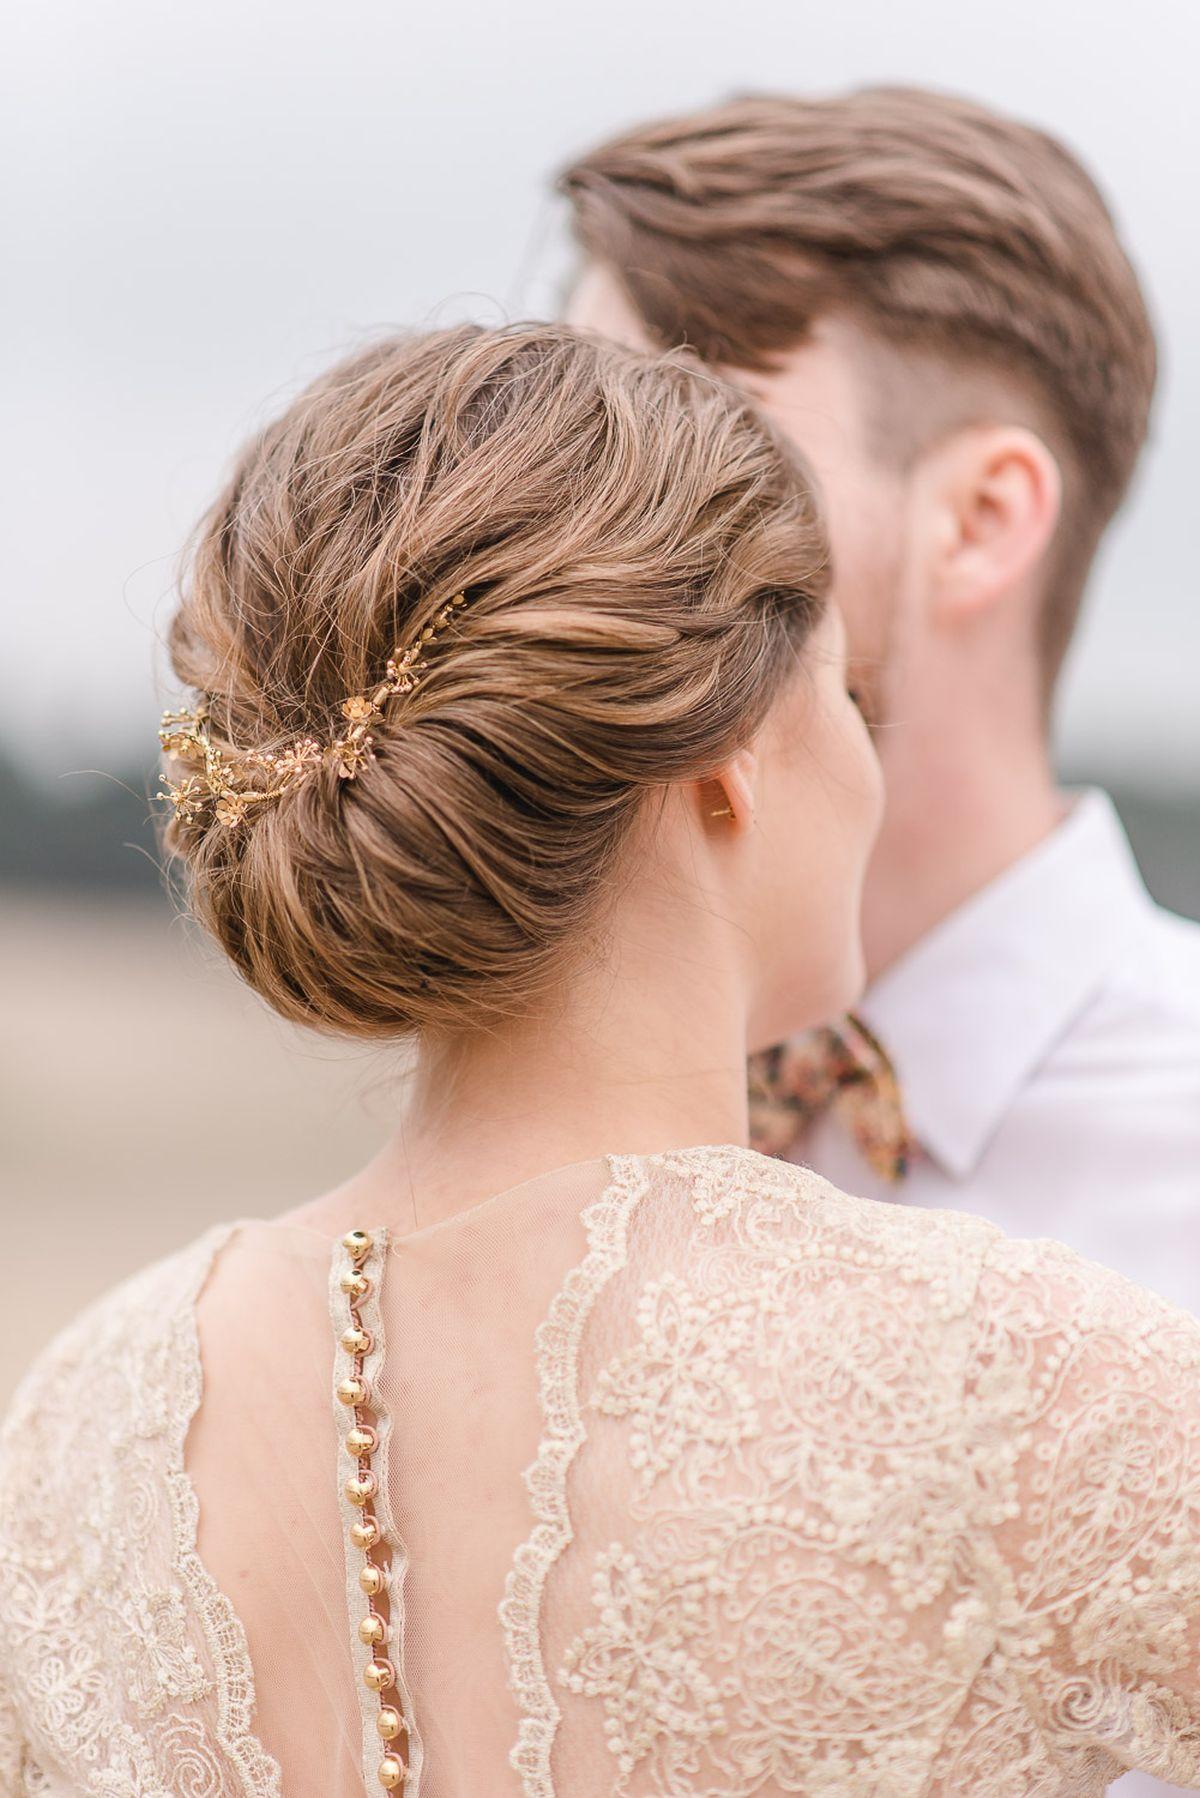 aschaaa-photography-wedding-shoot-wüste (13)